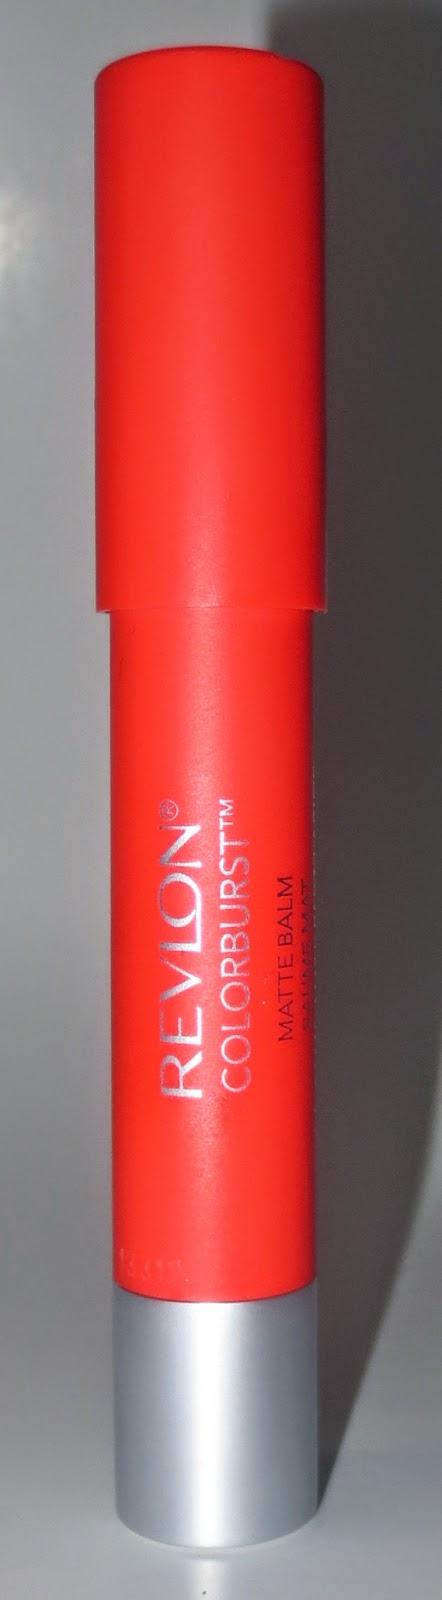 Revlon ColorBurst Matte Balm in Audacious